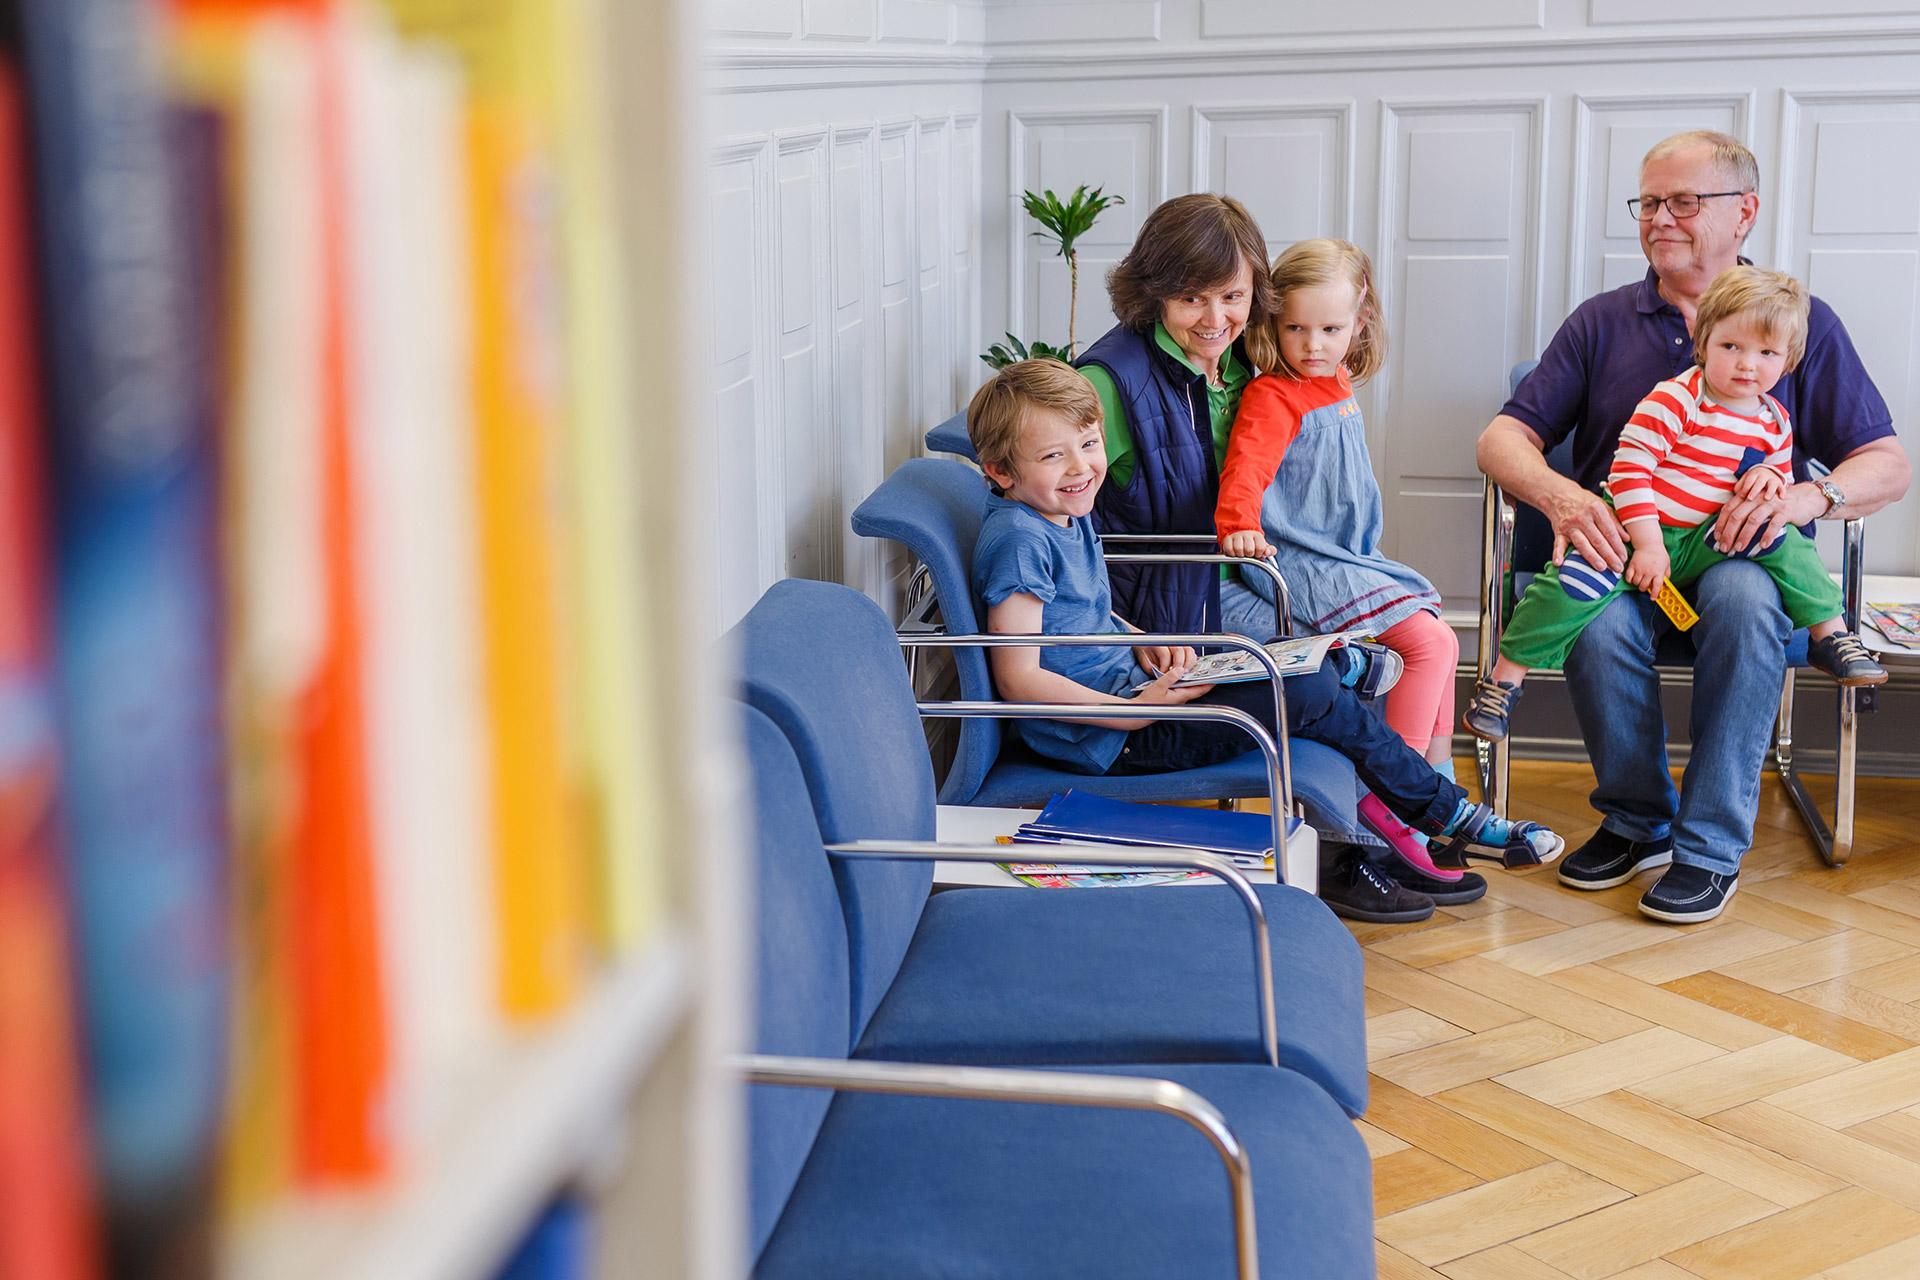 medizinische versorgungszentren in l beck in vebidoobiz finden. Black Bedroom Furniture Sets. Home Design Ideas